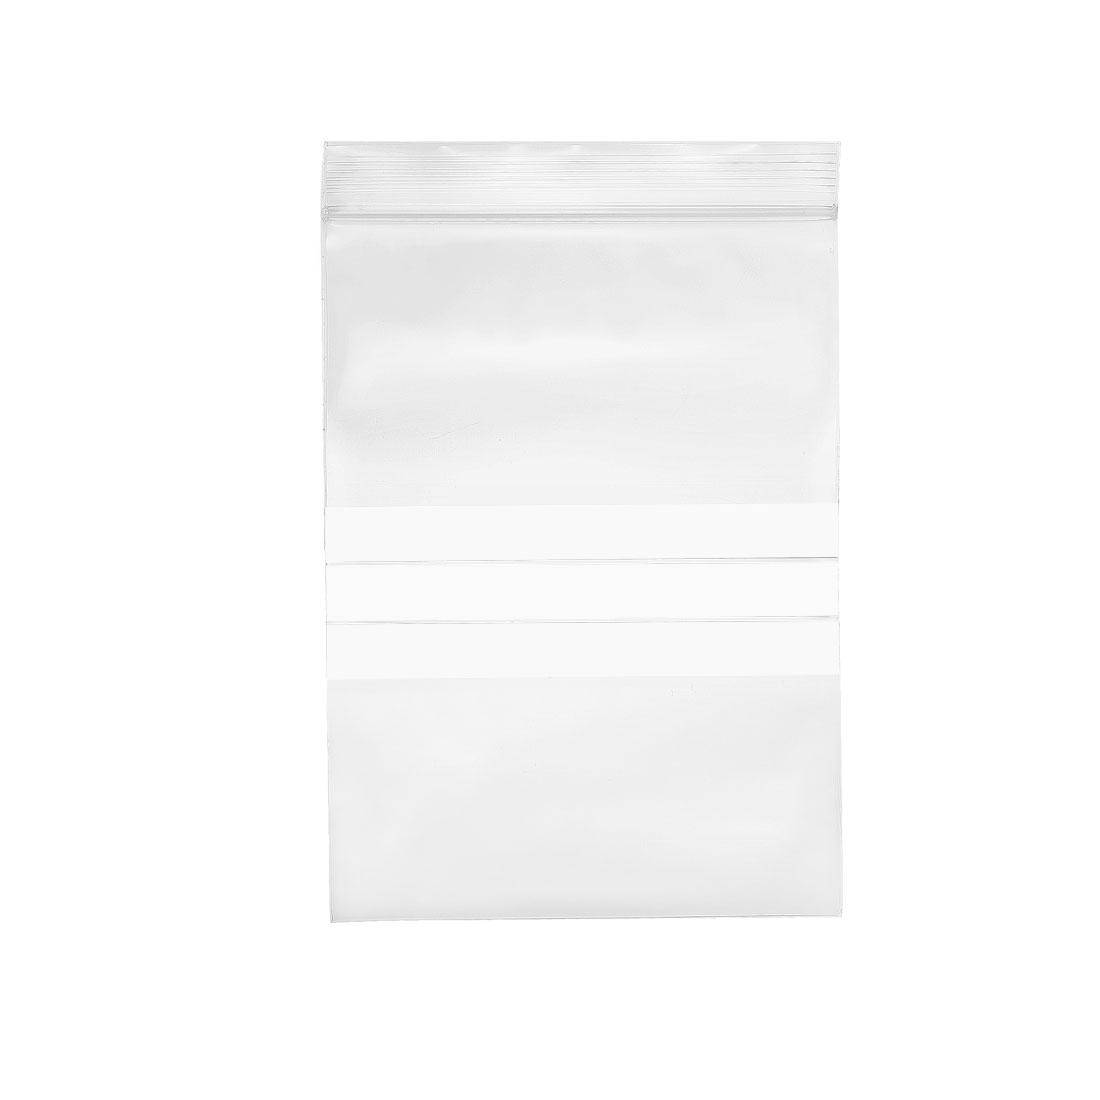 "33 Pcs Zip Lock Plastic Bags Writable Reclosable Disposable Clear 7""X4.7"" 8 MIL"